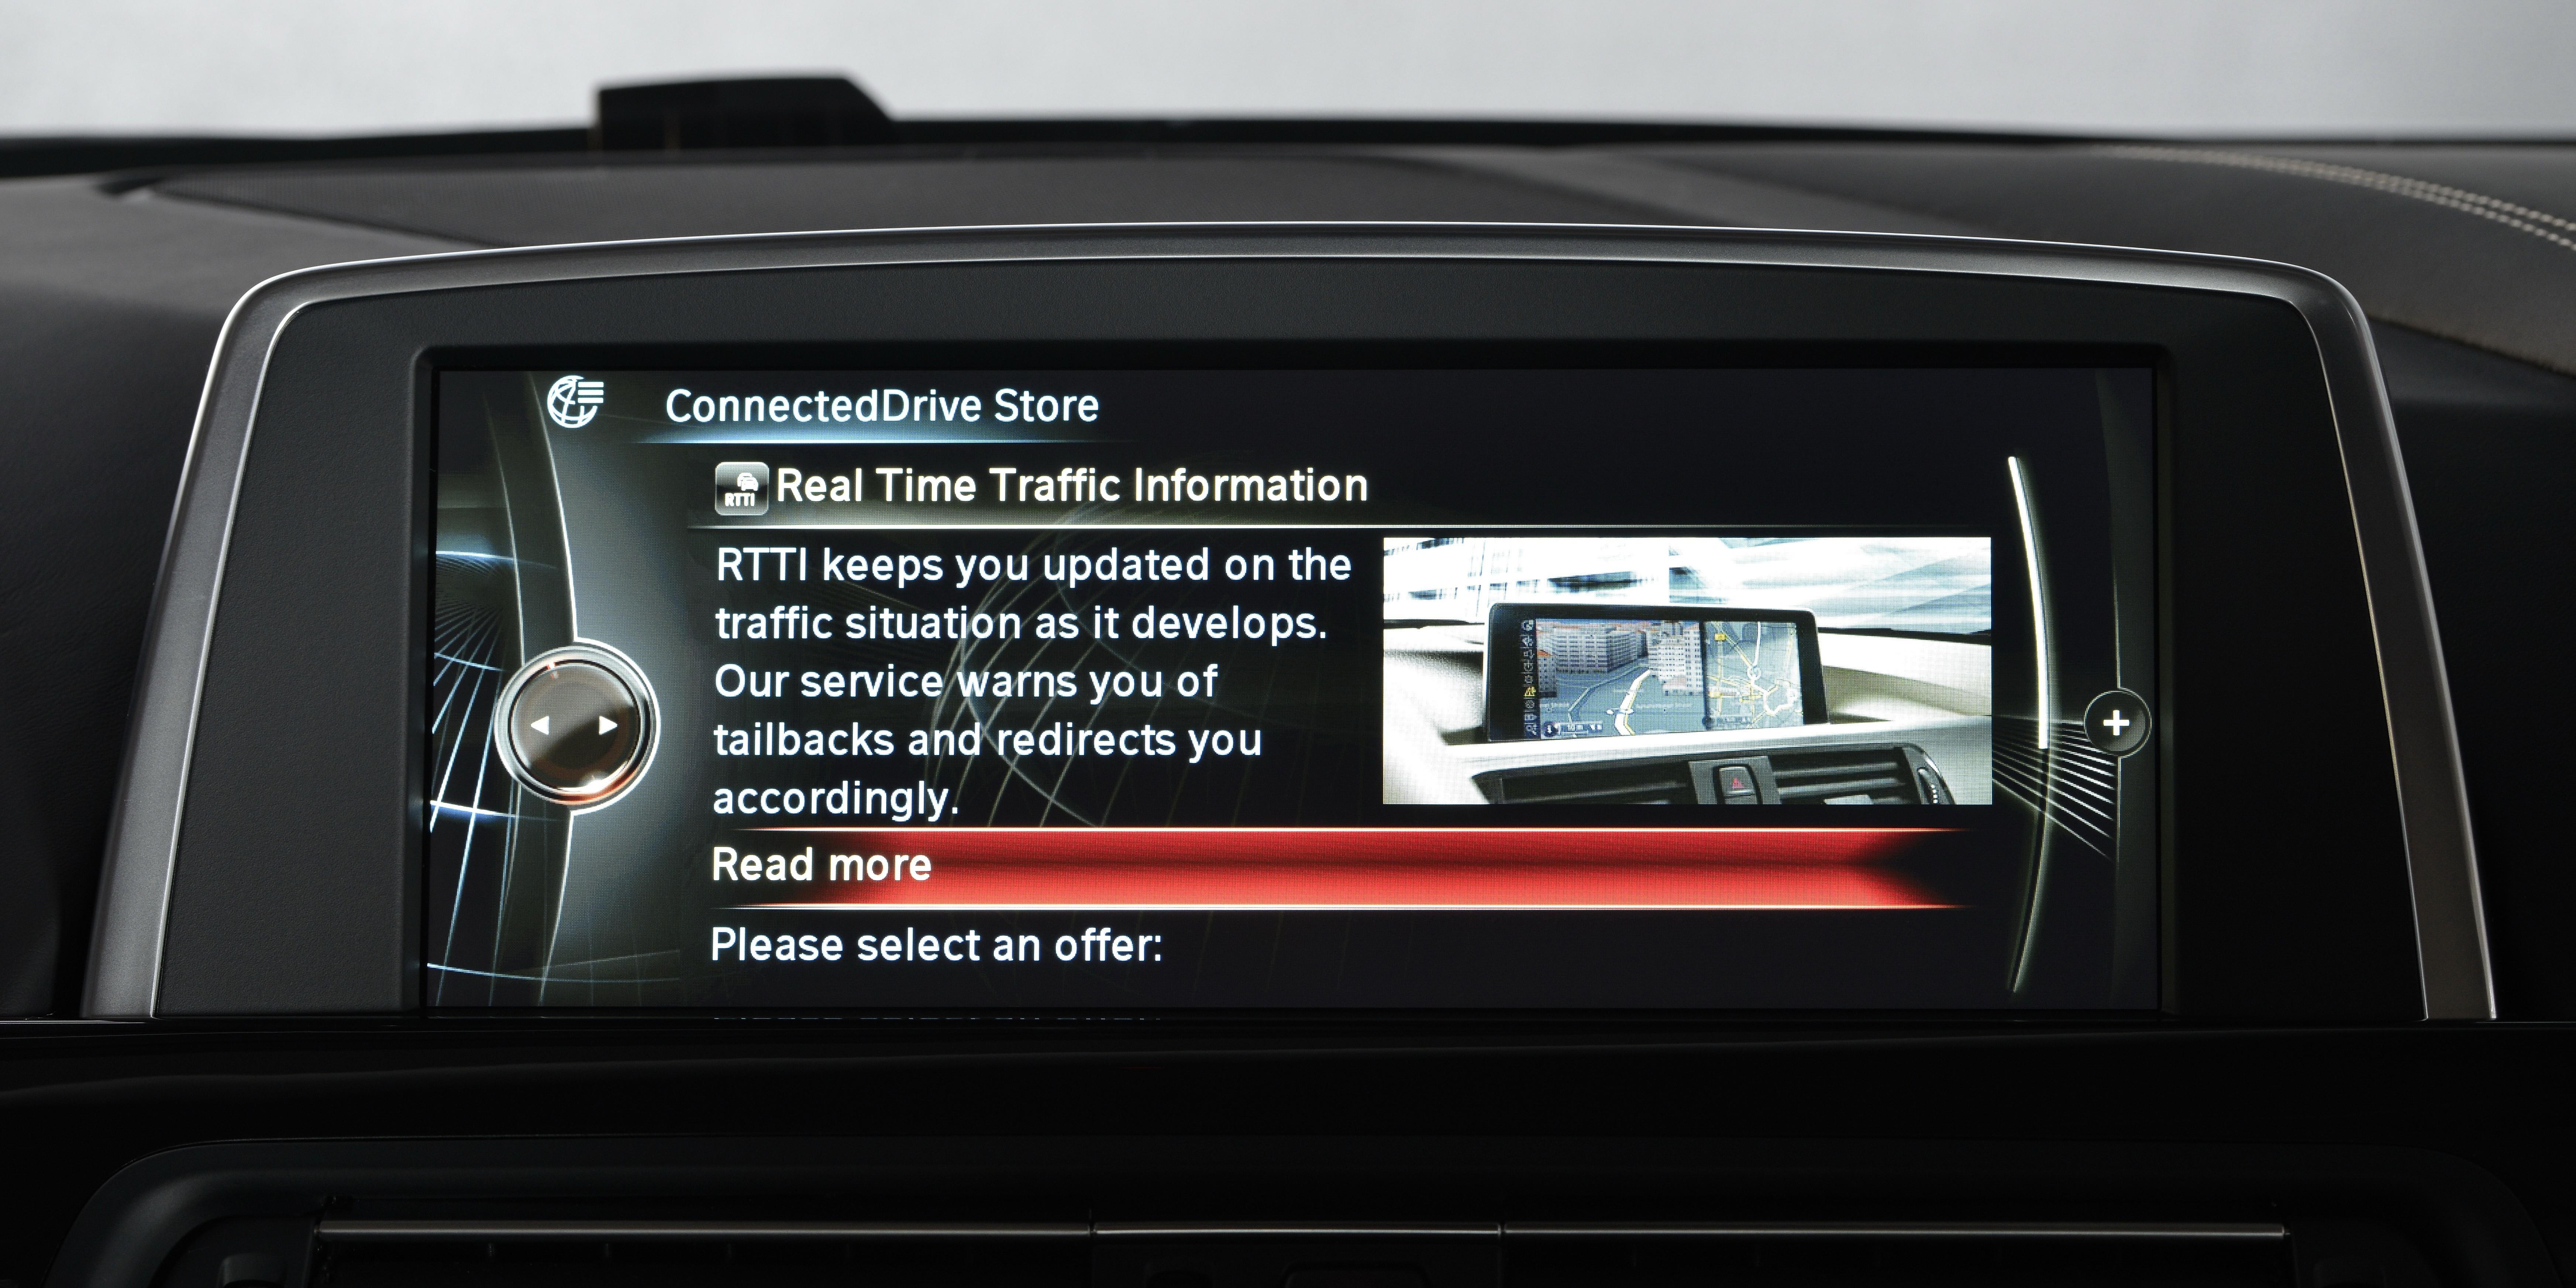 ConnectedDrive_June_2013